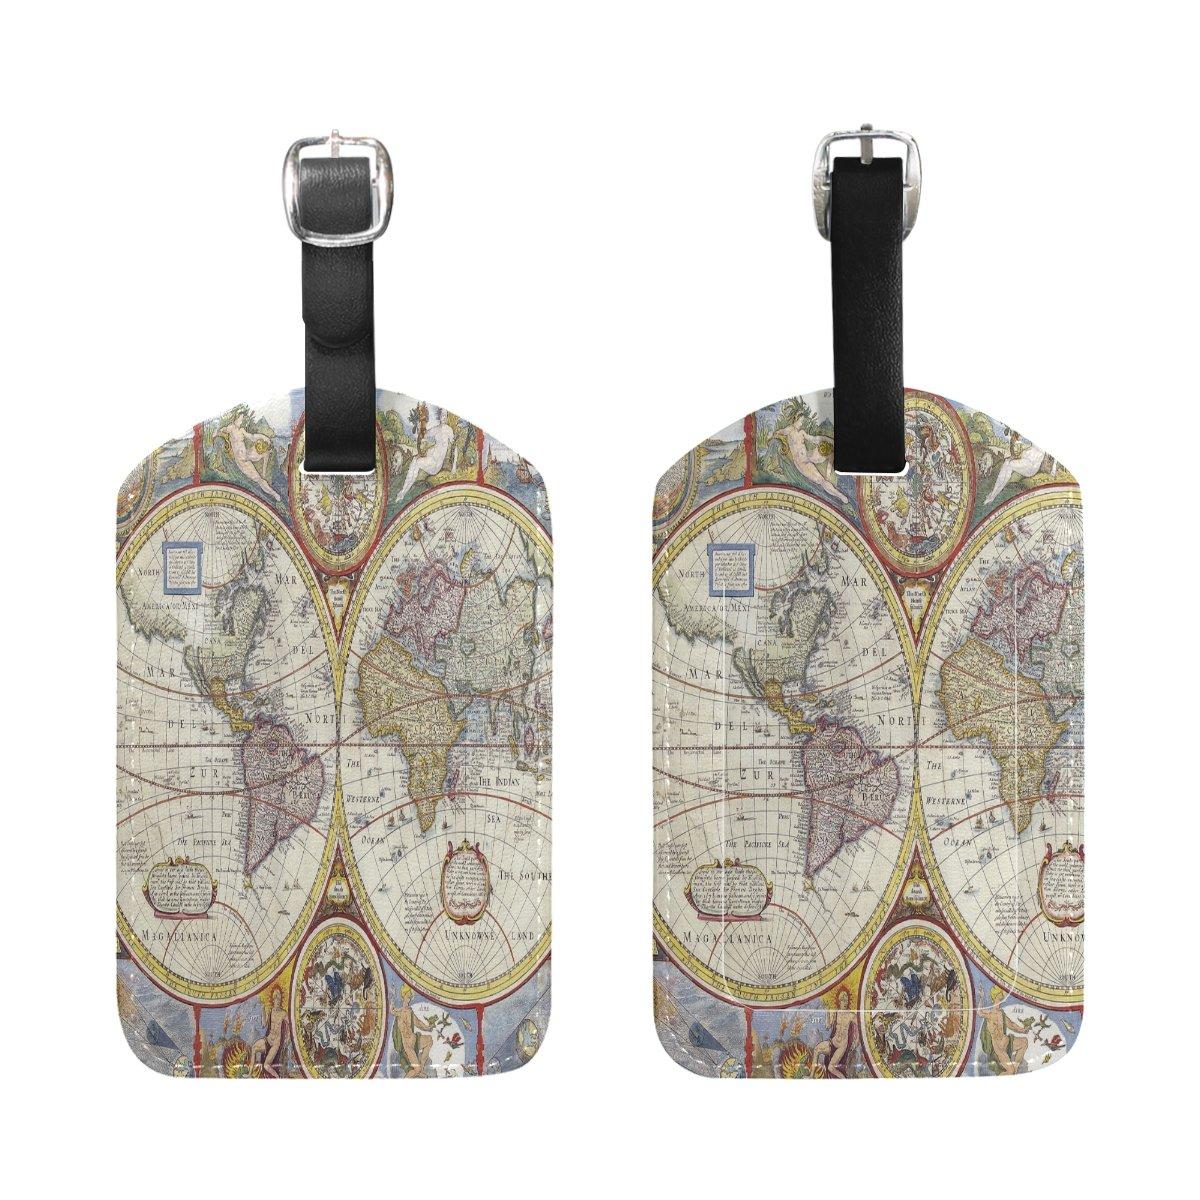 1Pcs Saobao Travel Luggage Tag World Map PU Leather Baggage Suitcase Travel ID Bag Tag